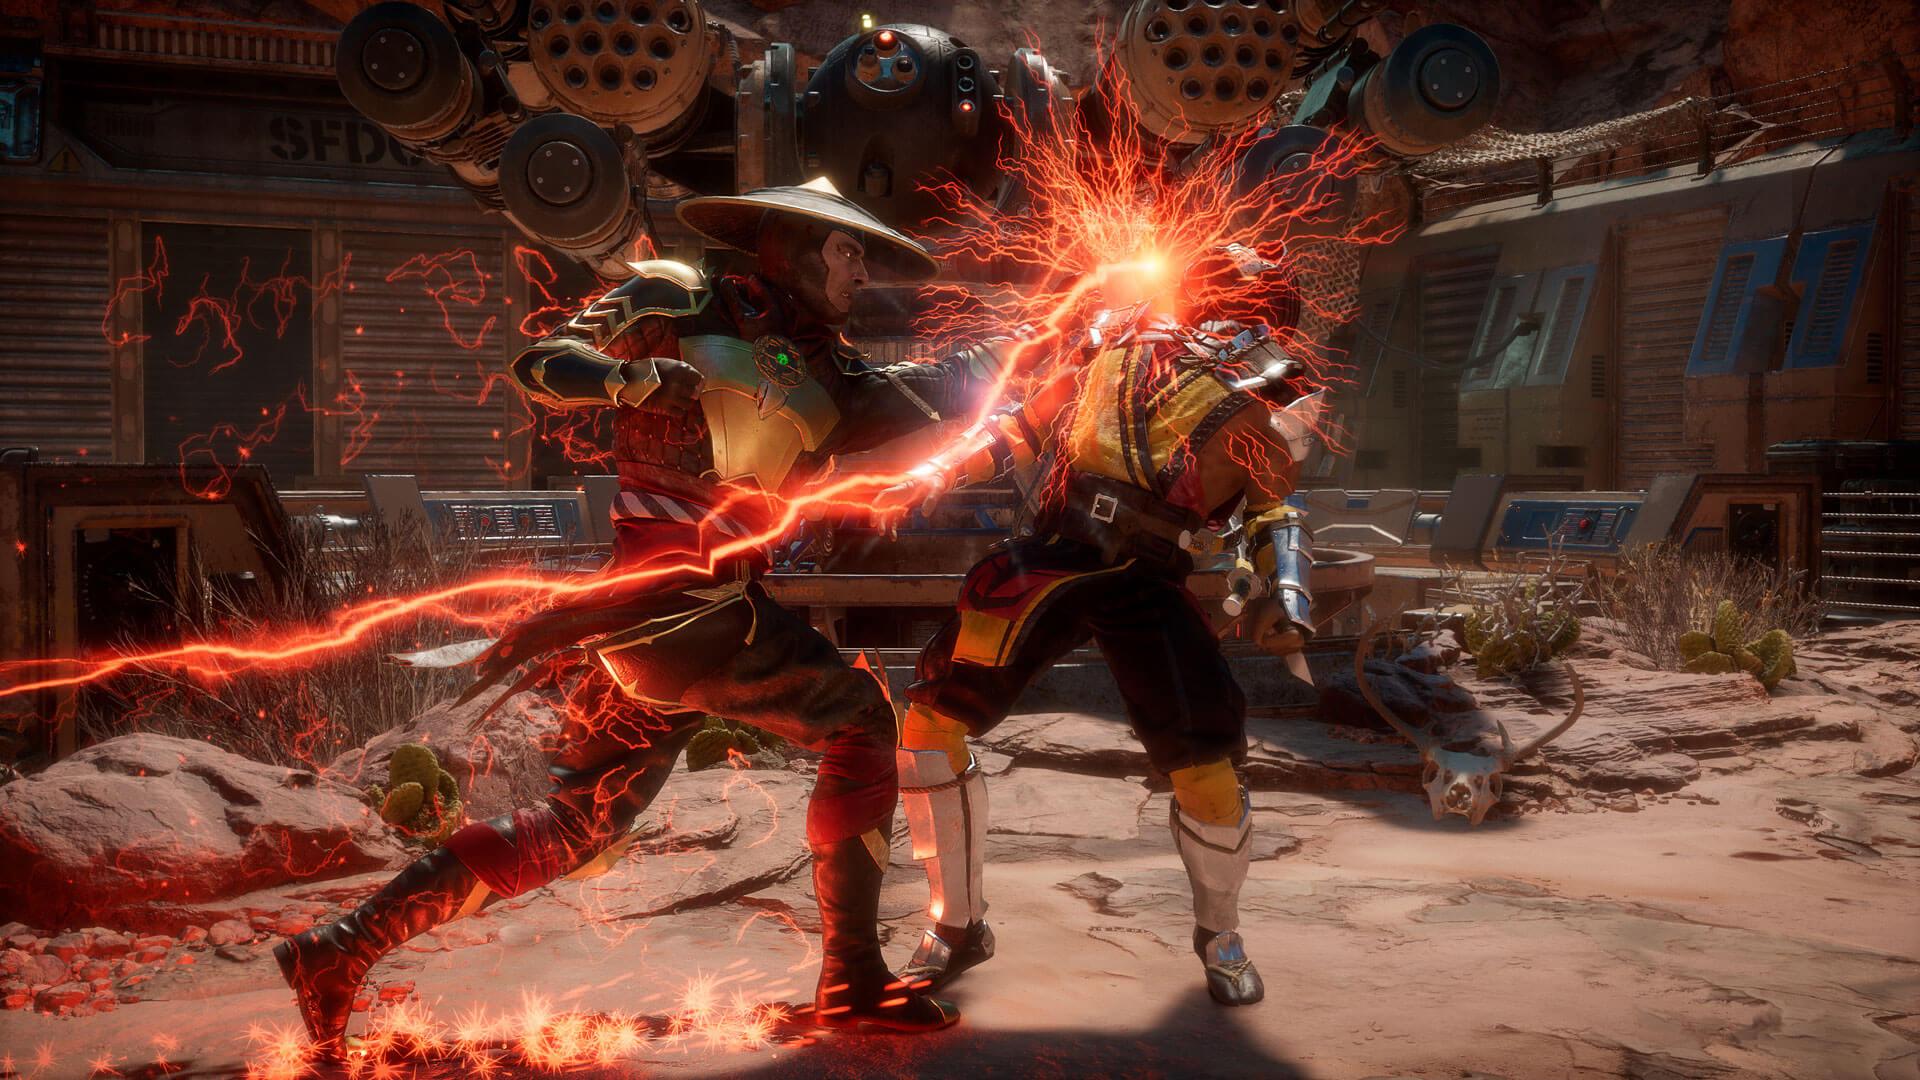 Mortal Kombat 11 free download wallpaper